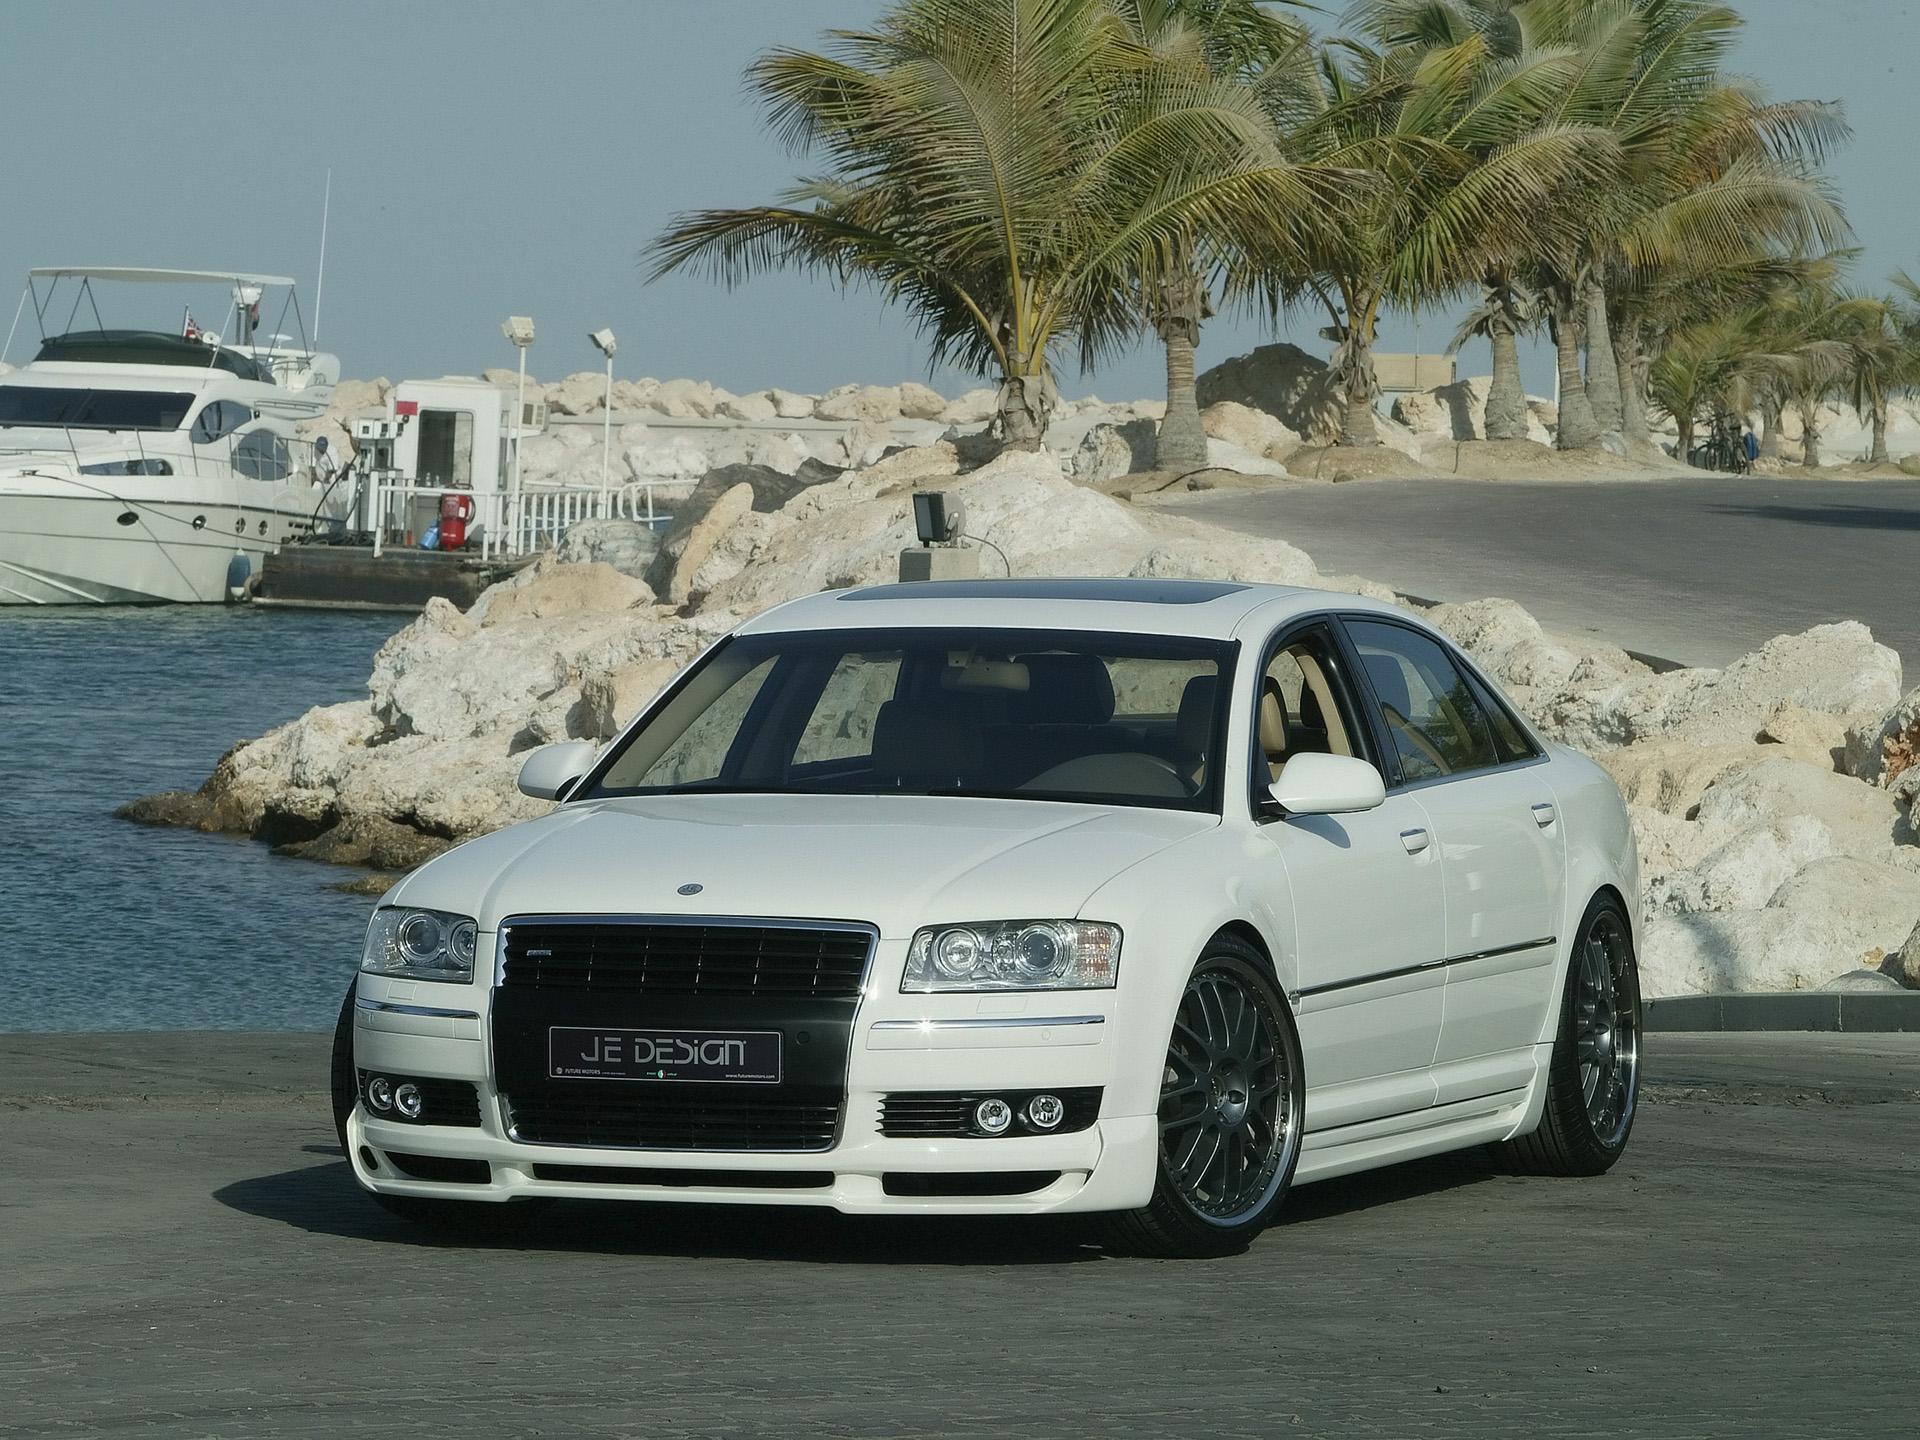 Je Design Audi A8 Photos Photogallery With 7 Pics